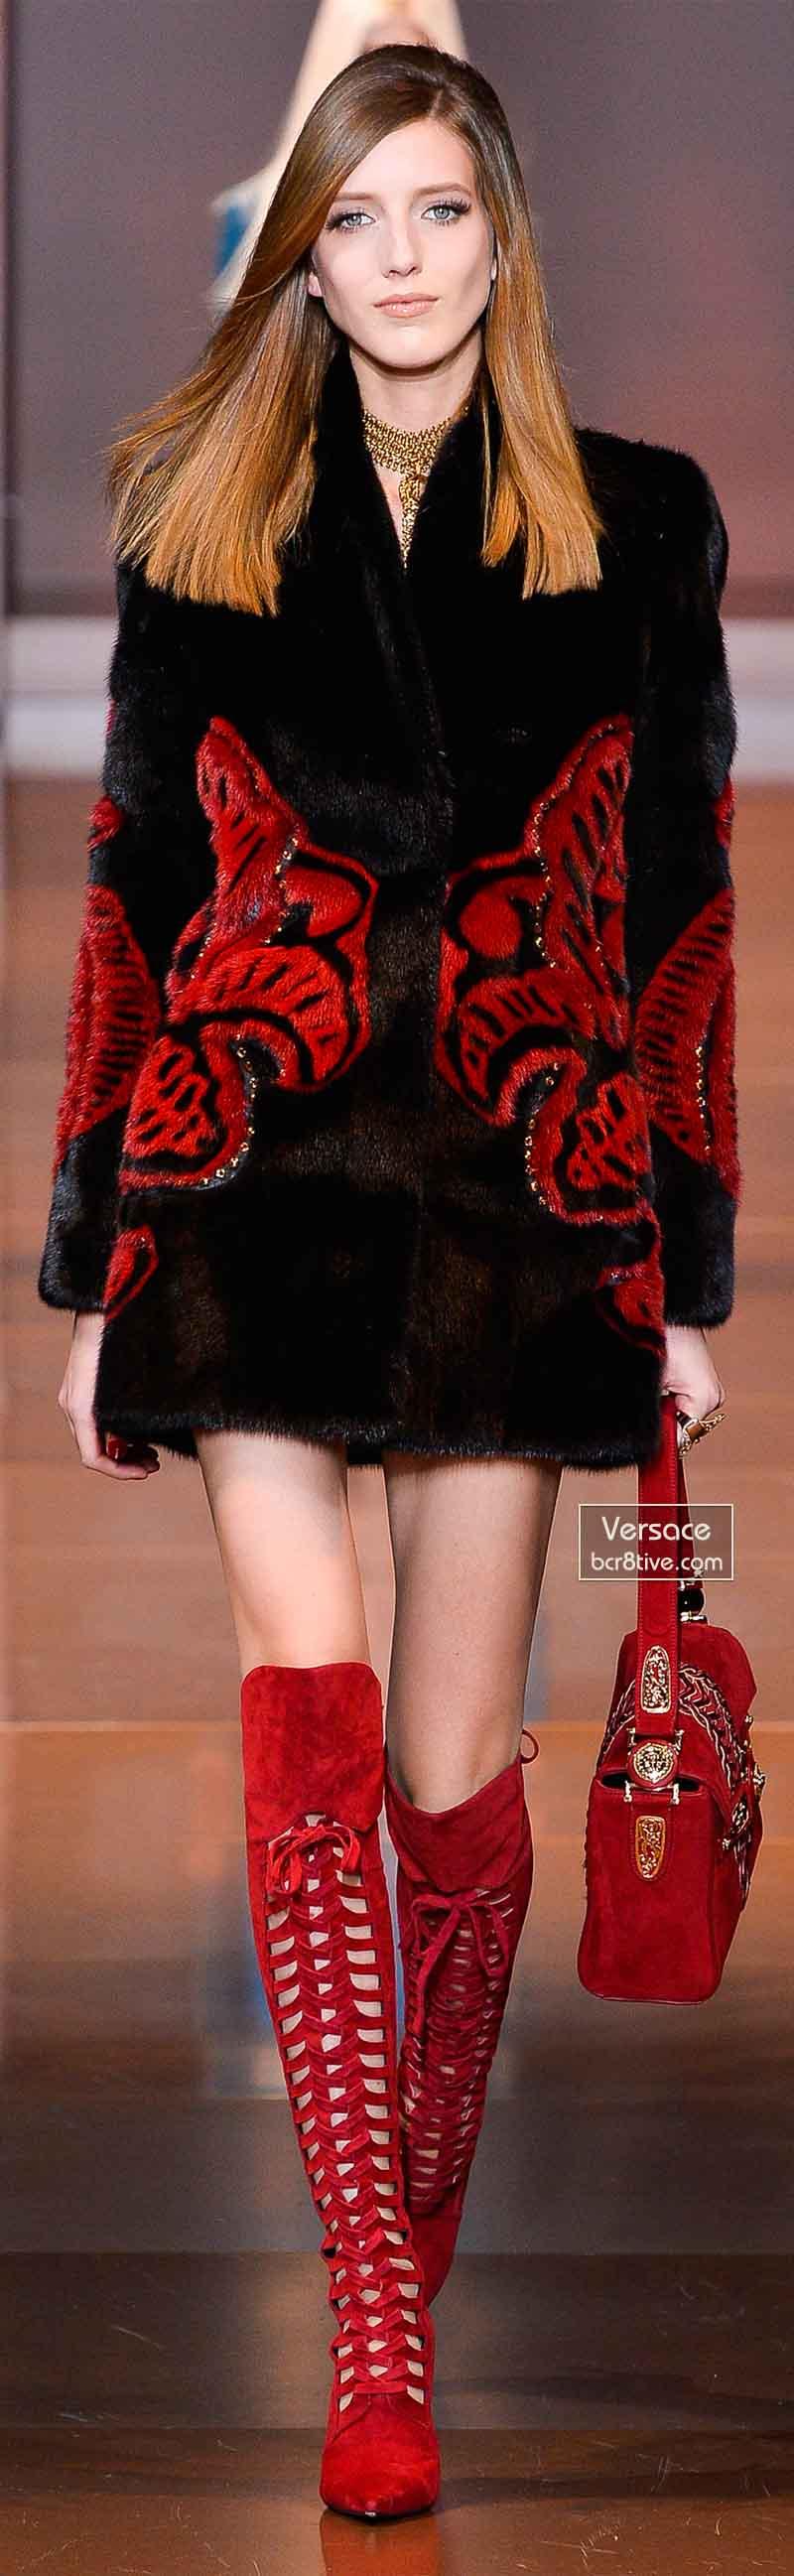 Versace Fall 2014 - Iris Egbers